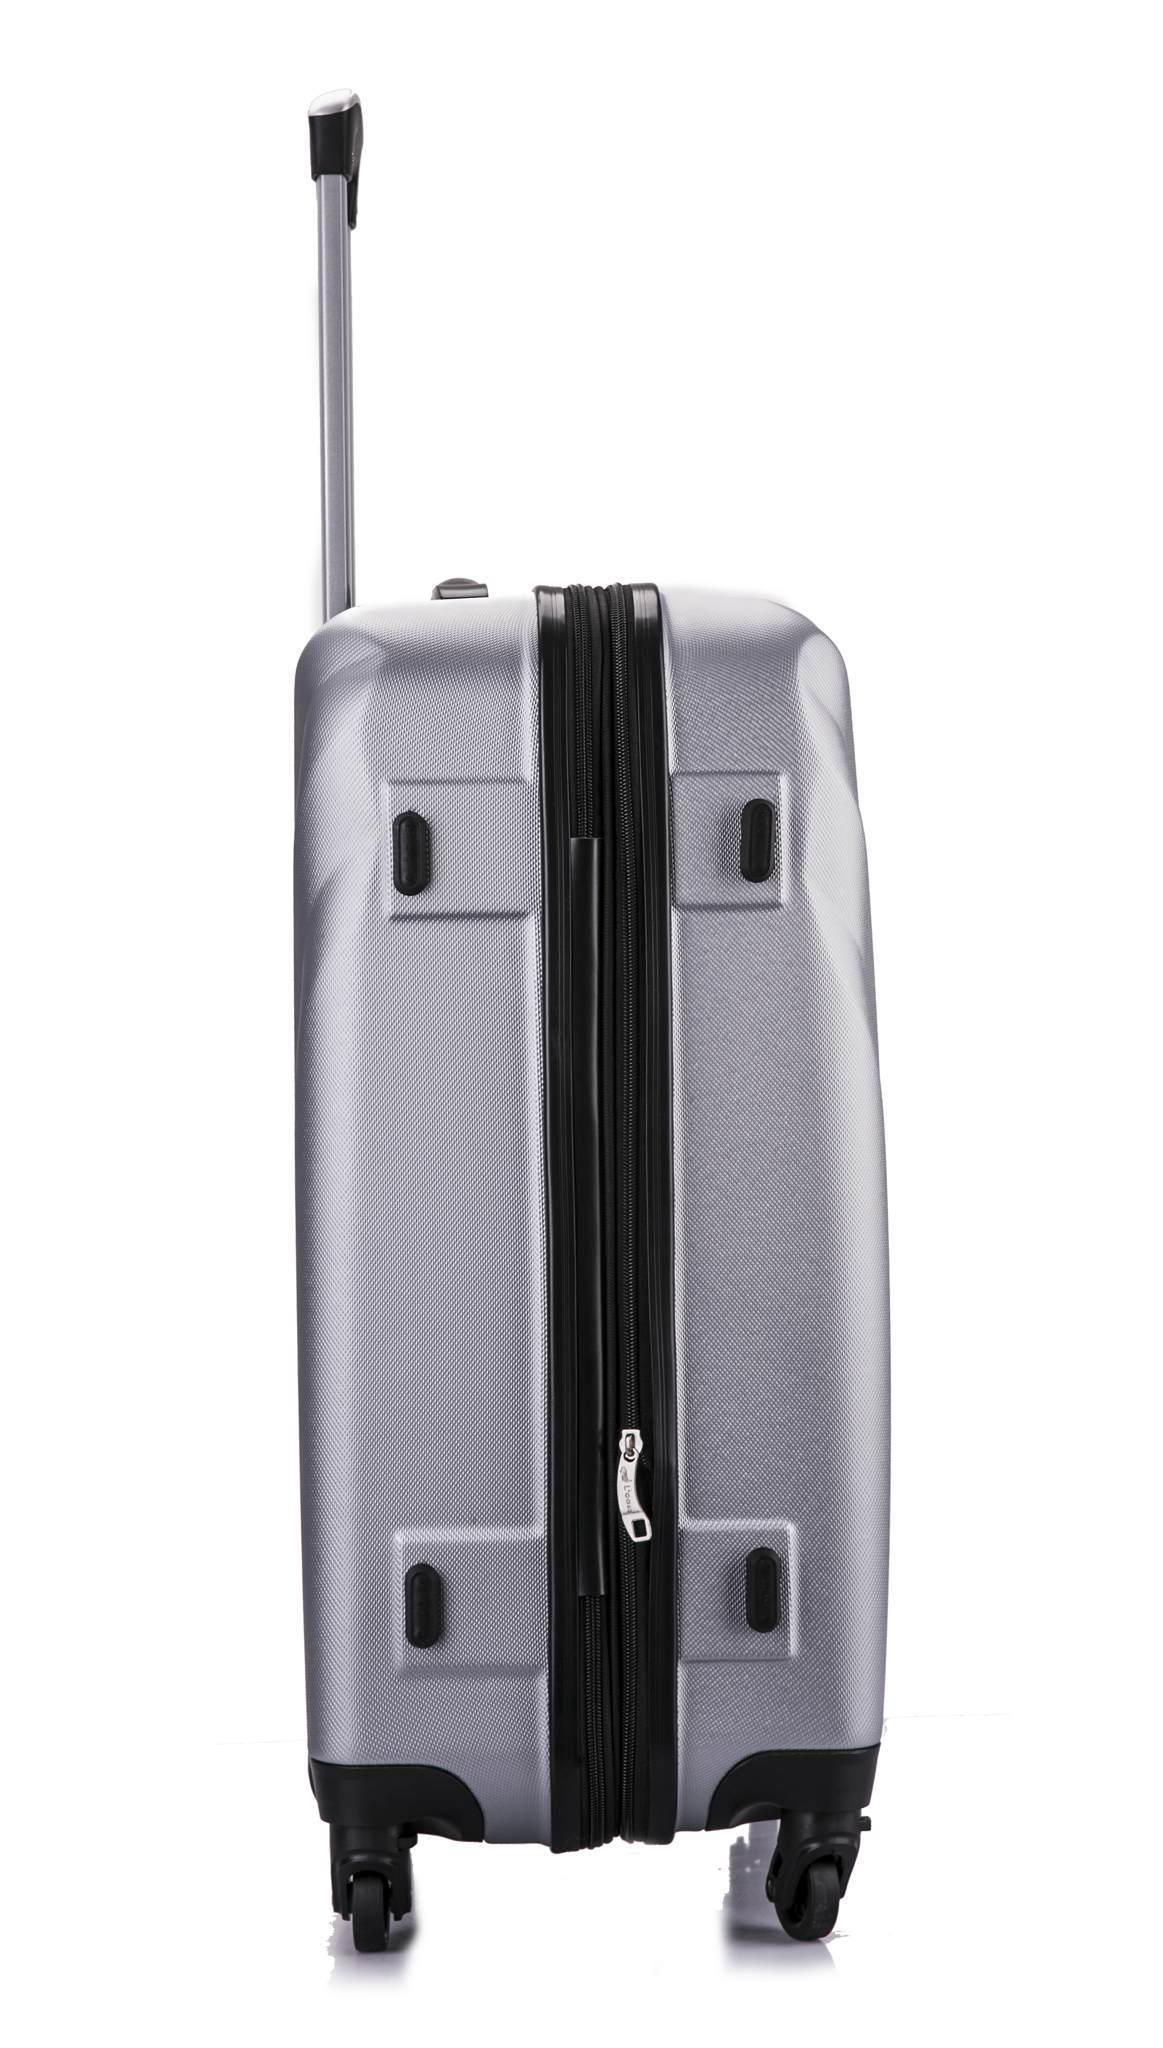 Чемодан с расширением L'case Phuket-28 Серебро (XL)